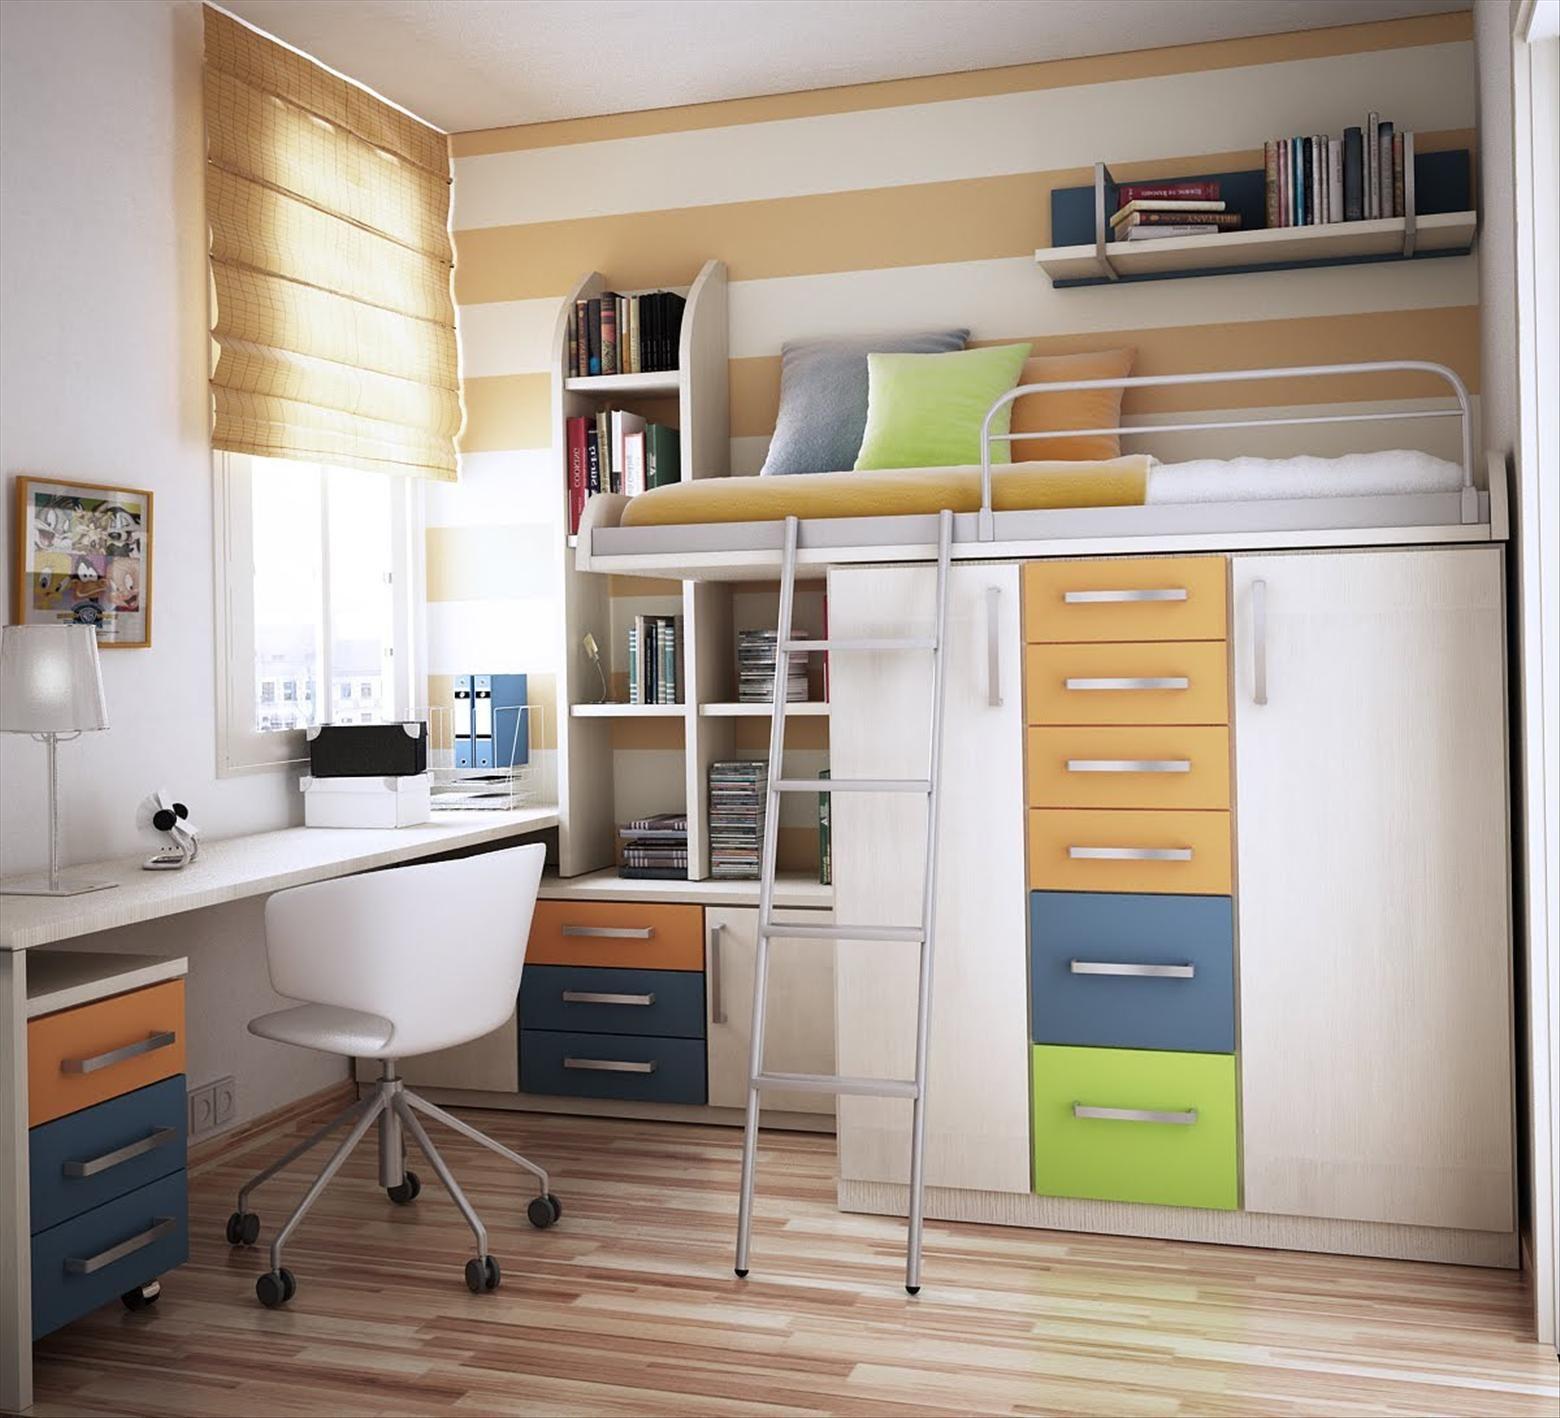 18 brilliant bedroom designs with creative storage ideas teenage rh pinterest com